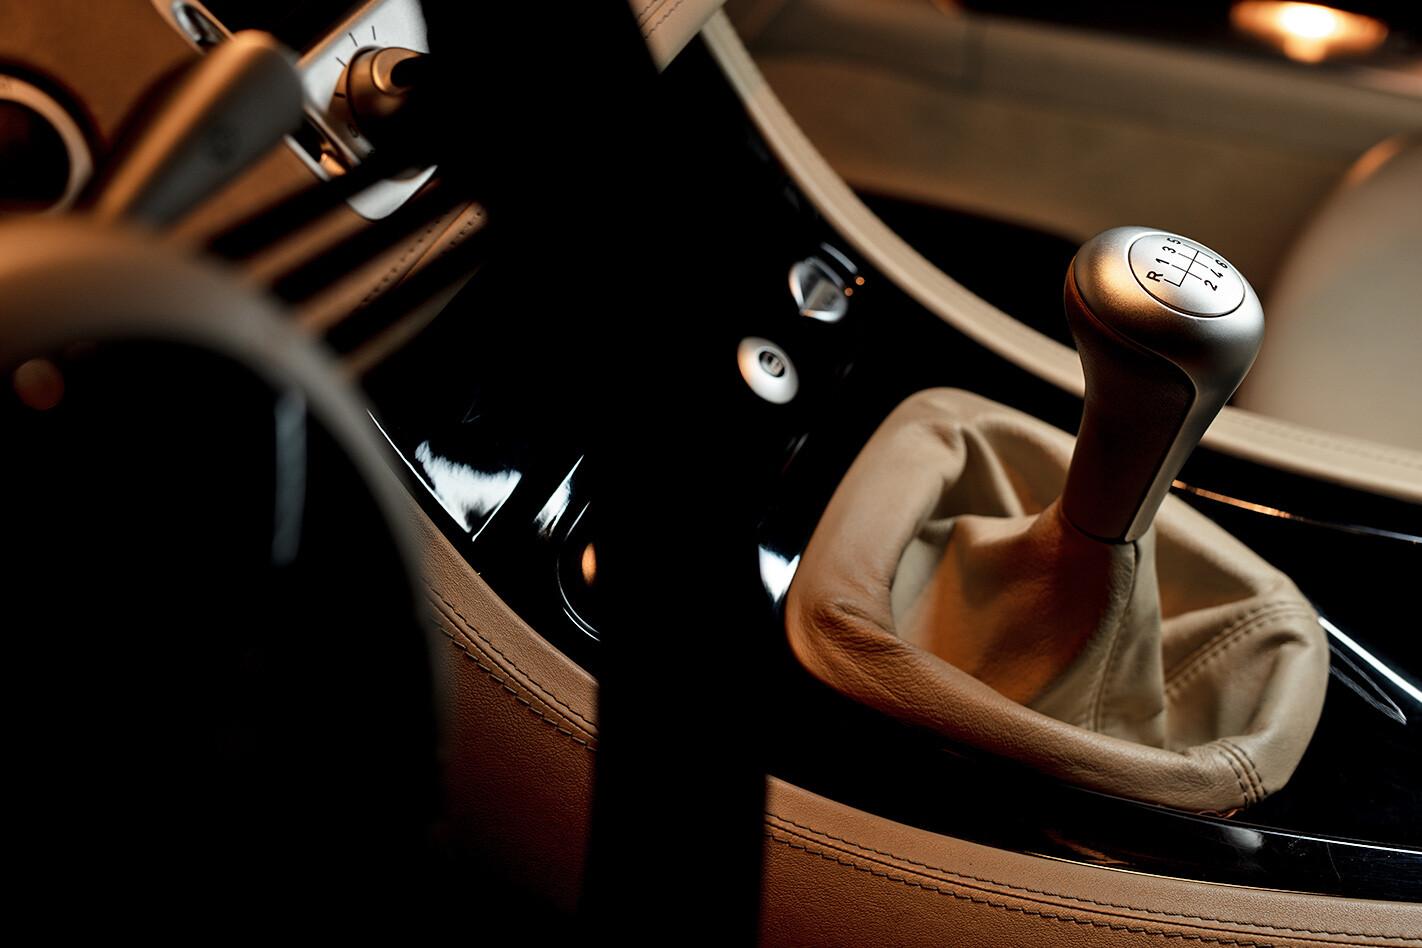 BMW Z8 centre console